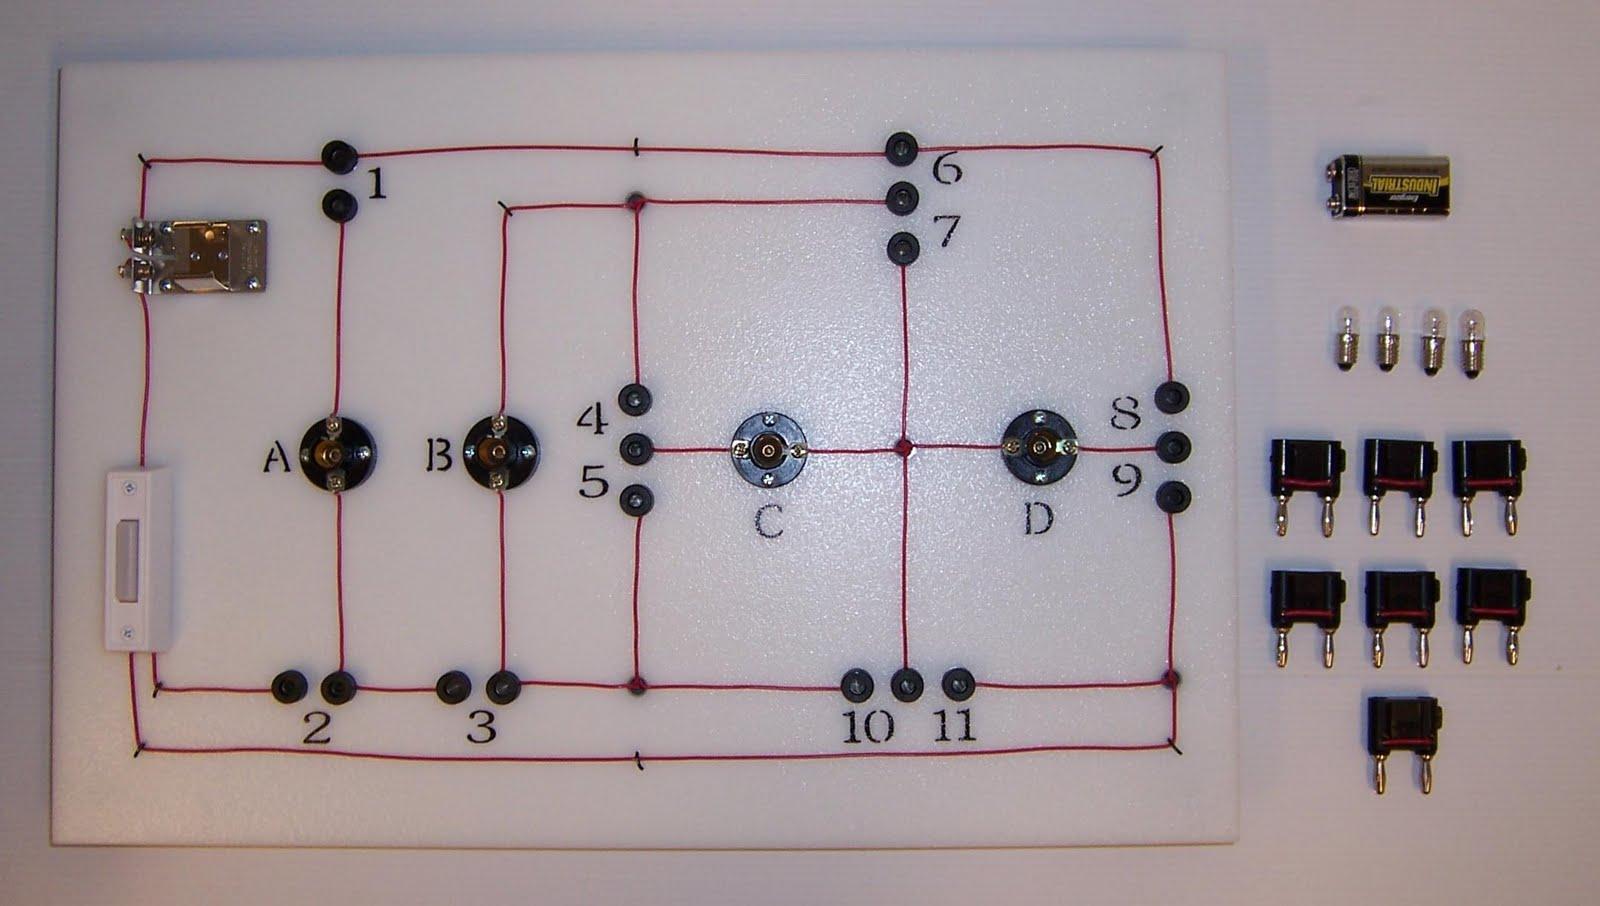 Greatest Hits Simple Circuits The Foutan Board H Walks Into A Bar